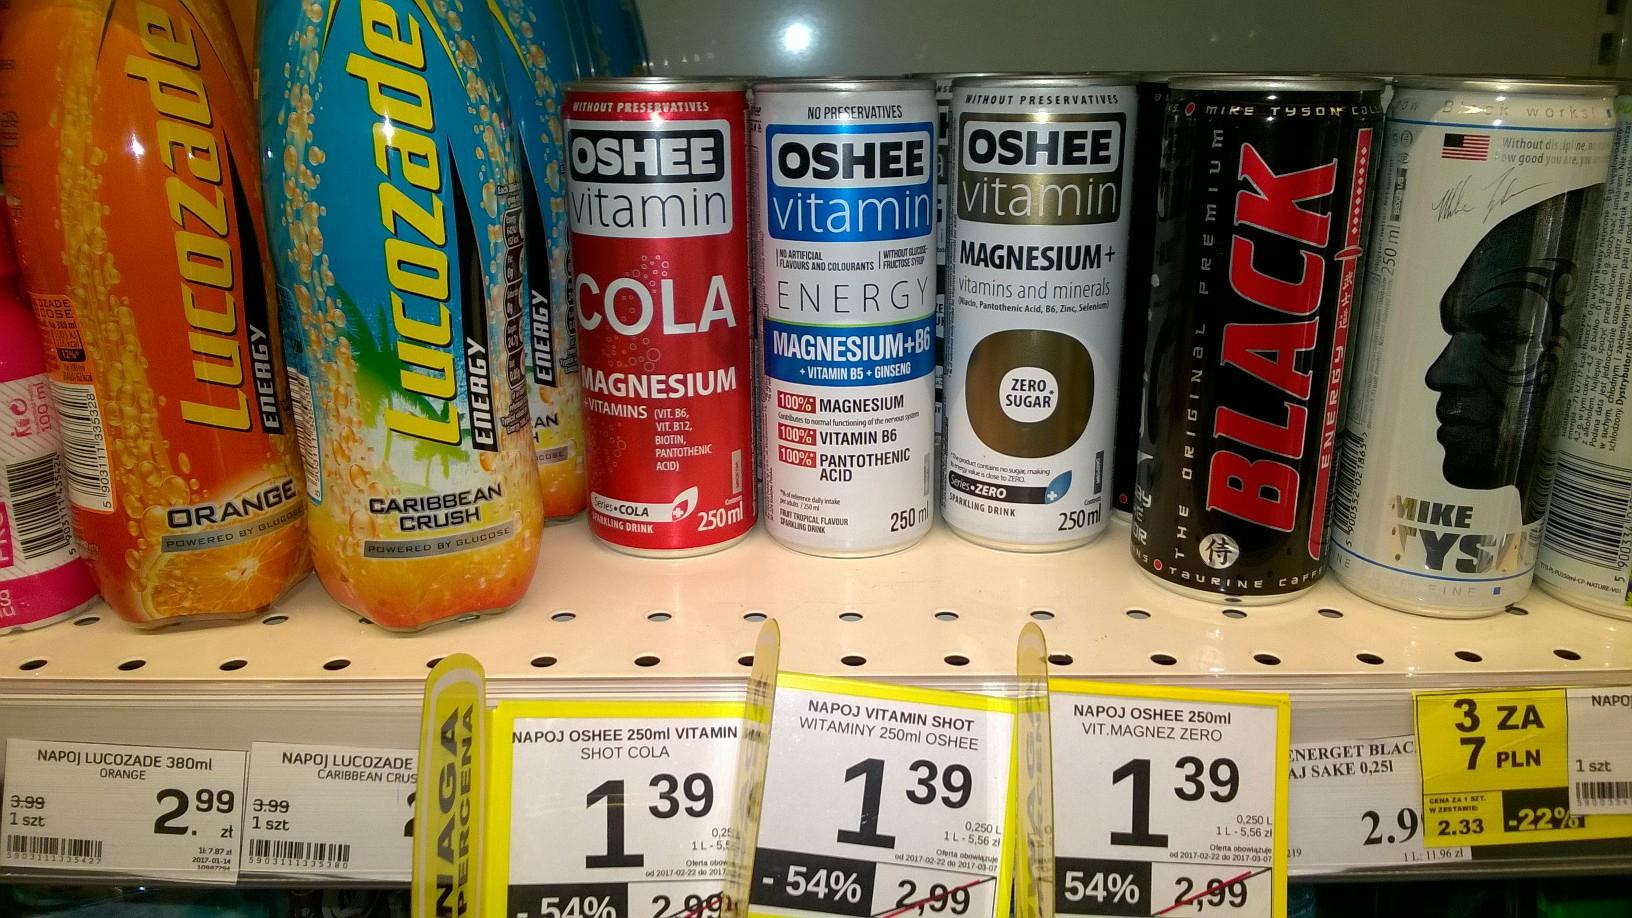 Oshee Vitamin za 1,39zł Energy, magnesium, Cola. -54%